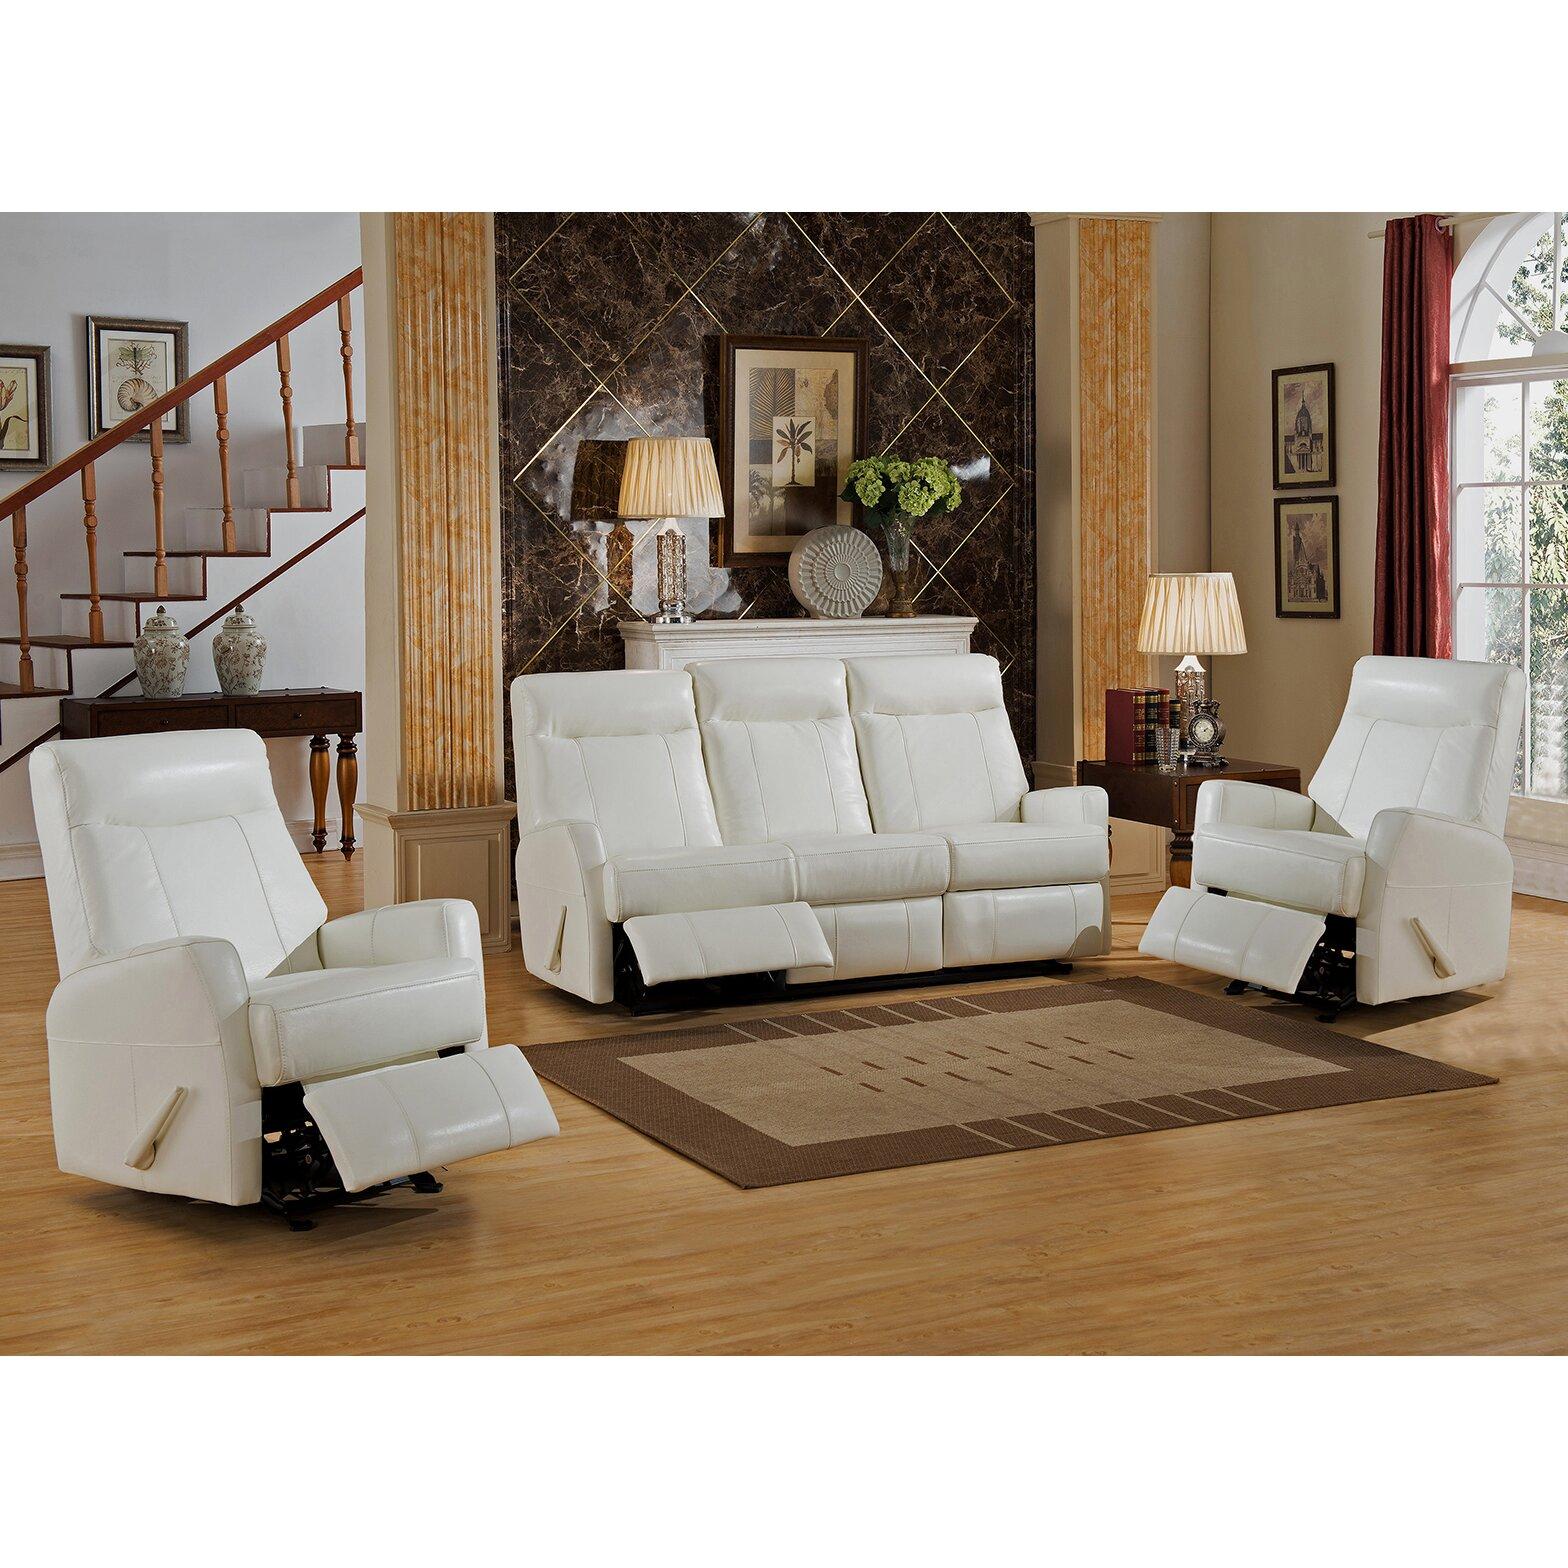 Amax toledo 3 piece leather living room set wayfair for Three piece living room set